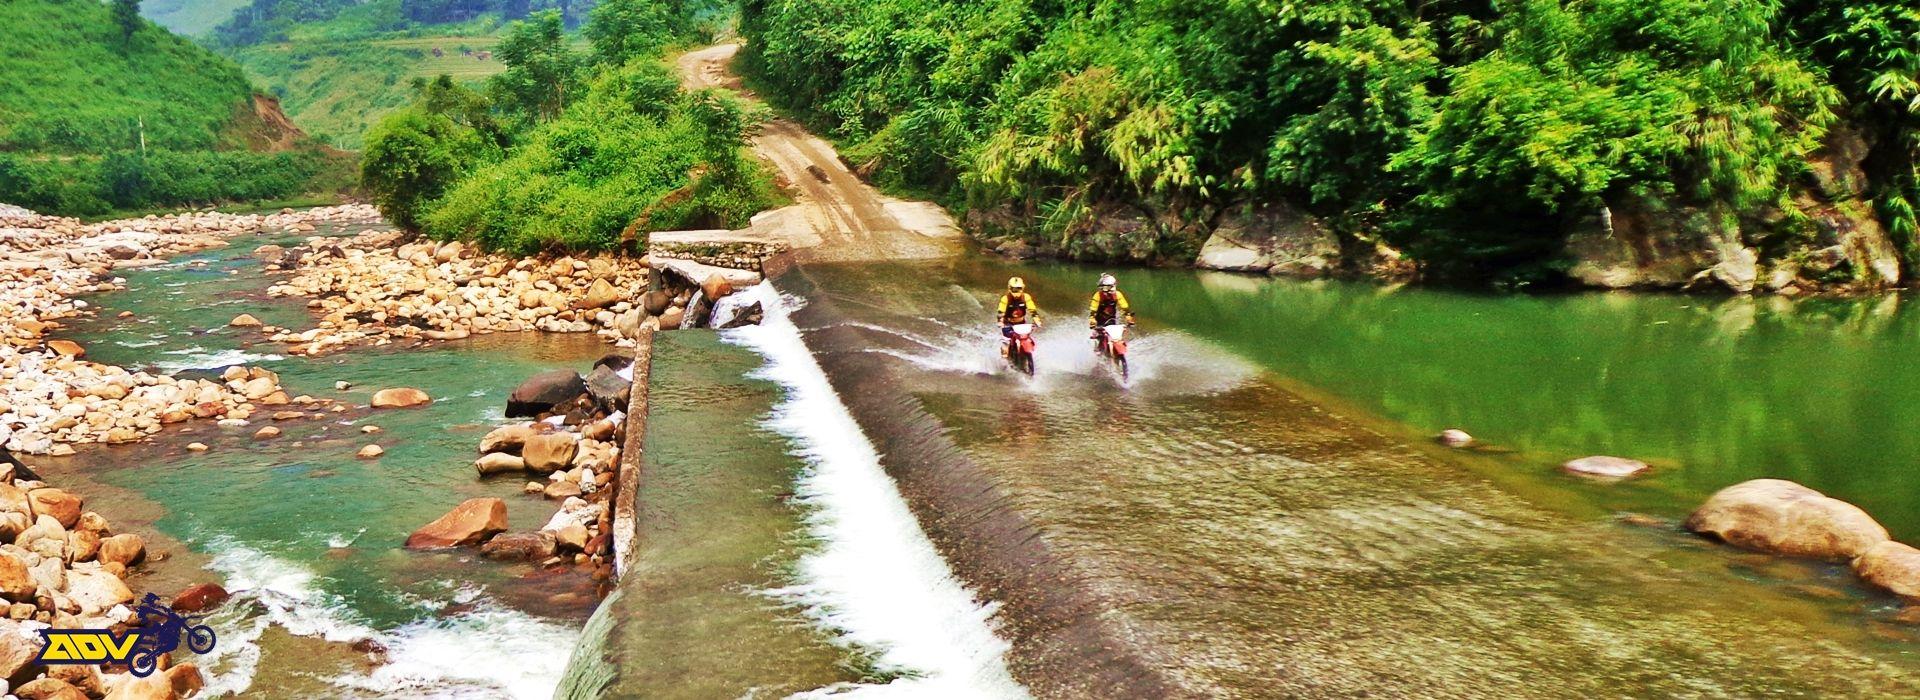 Vietnam motorbike adventure